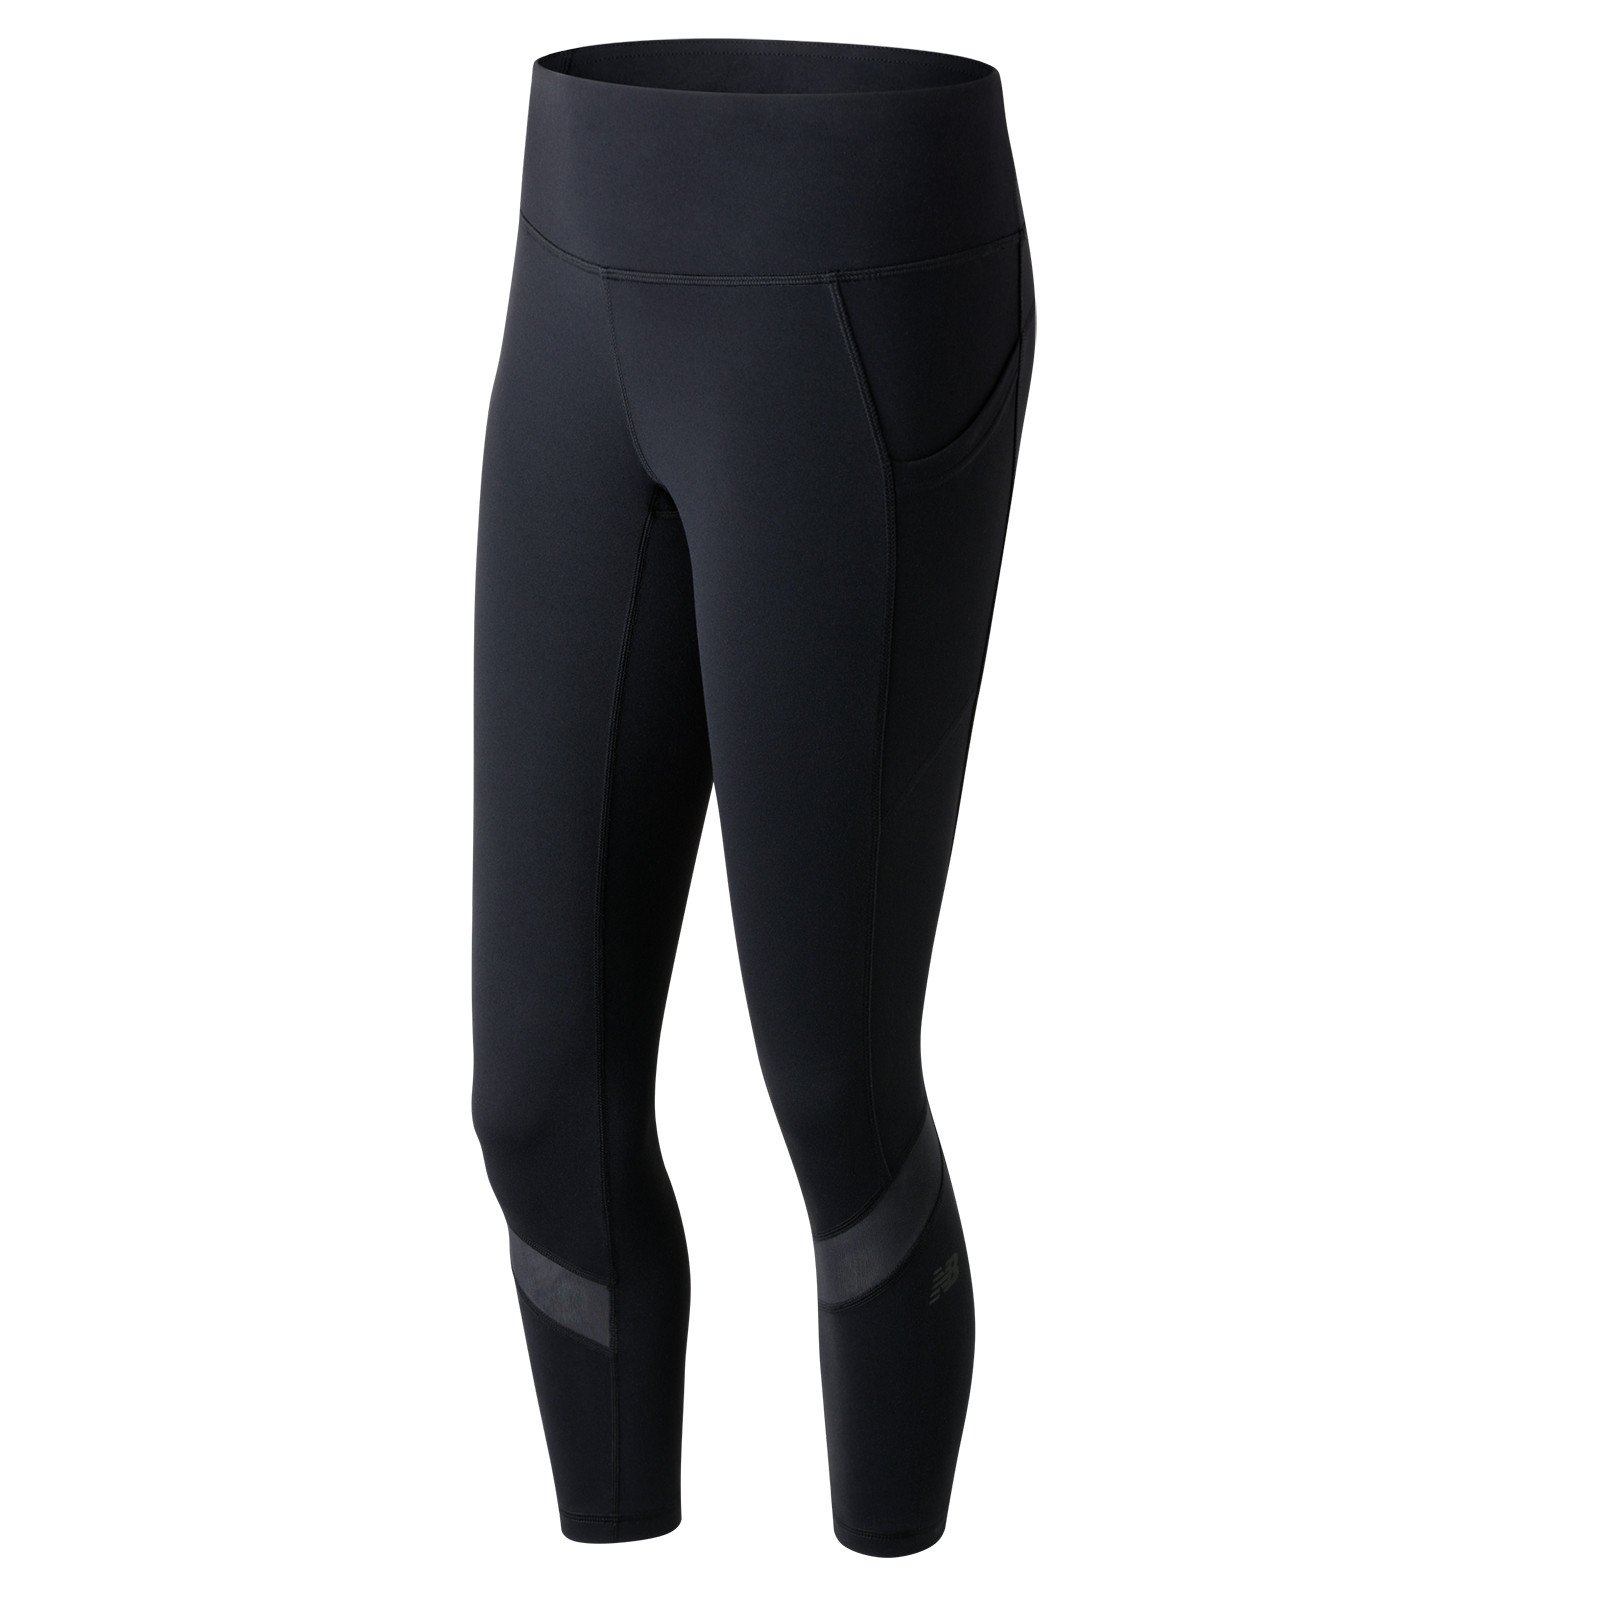 New Balance Women's Premium Performance Fashion Crop Pants, Black, X-Small